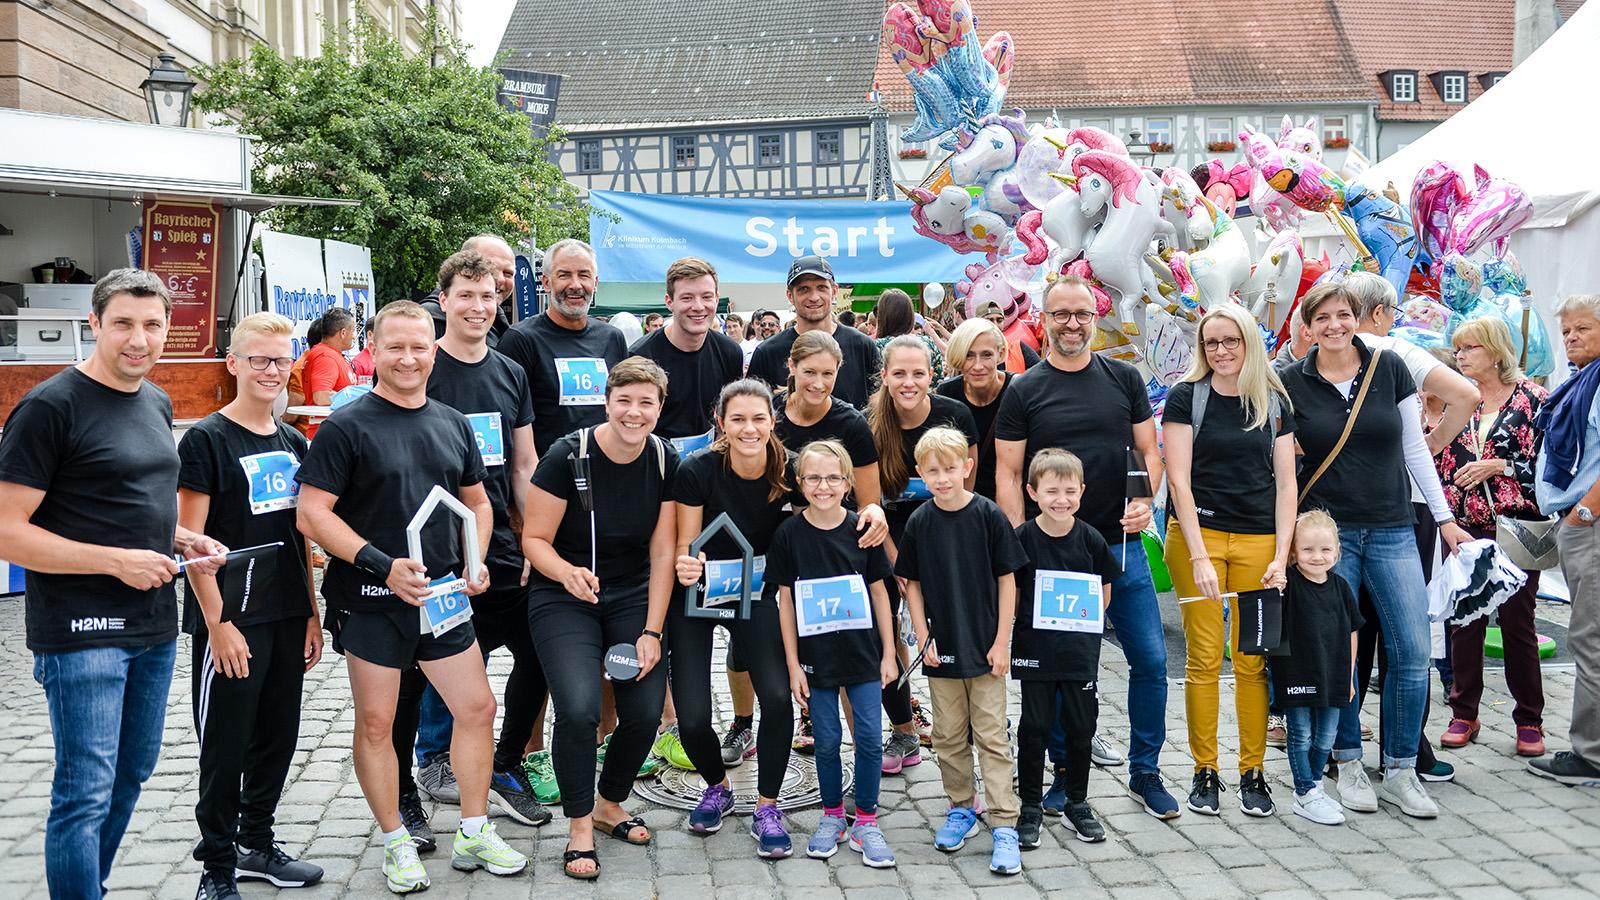 h2m-altstadtfirmenlauf-kulmbach-team